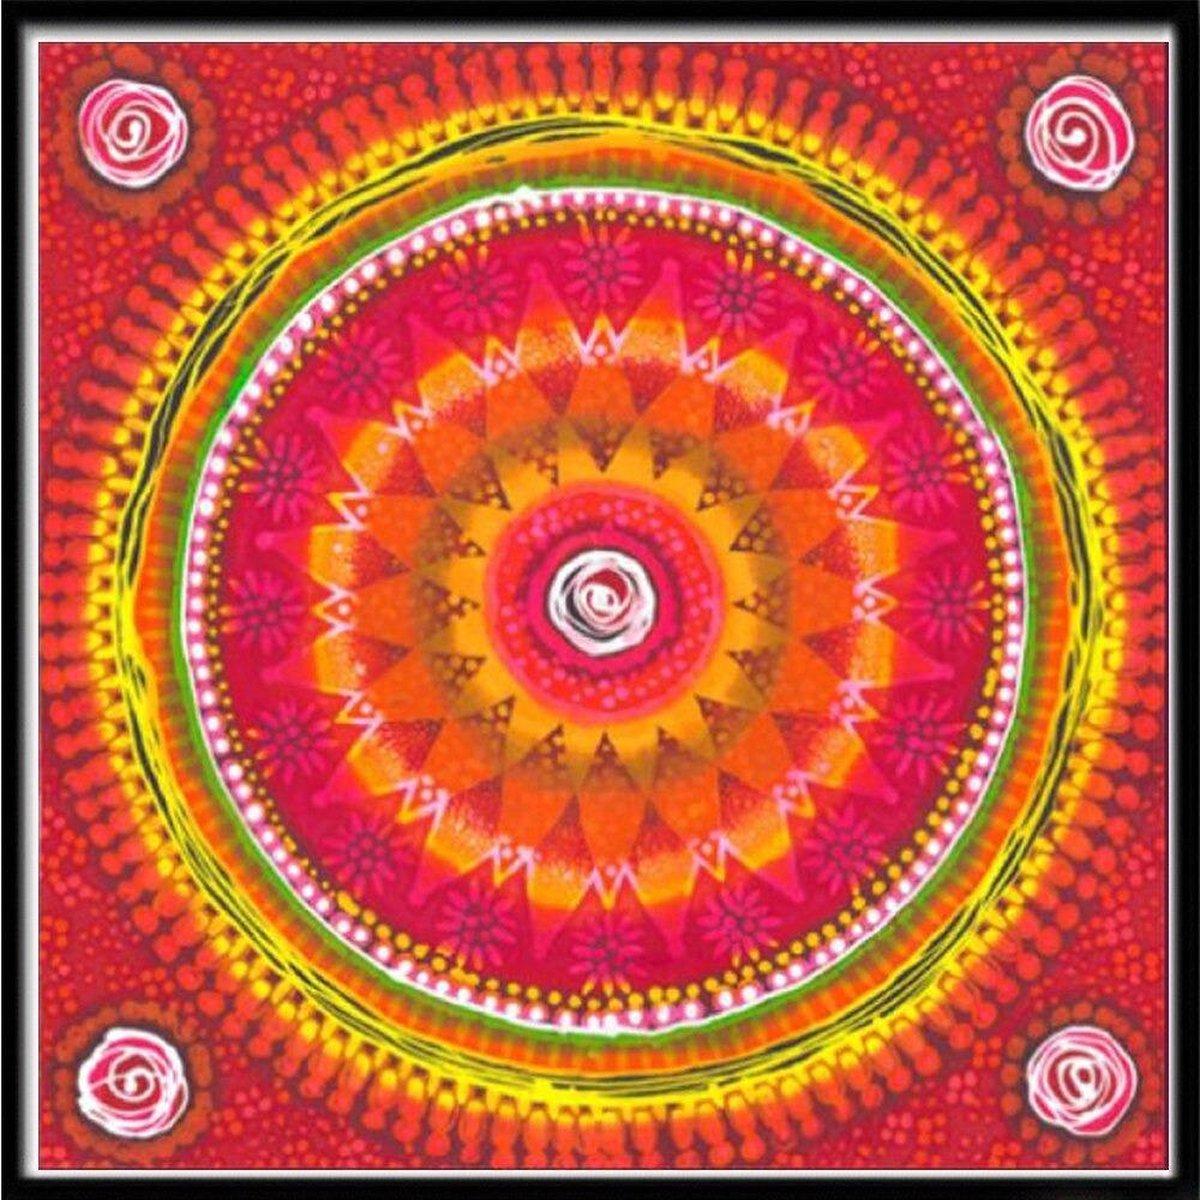 Premium Paintings - Mandala Oranje - Diamond Painting Volwassenen - Pakket Volledig / Pakket Full - 40x40 cm - Moederdag cadeautje